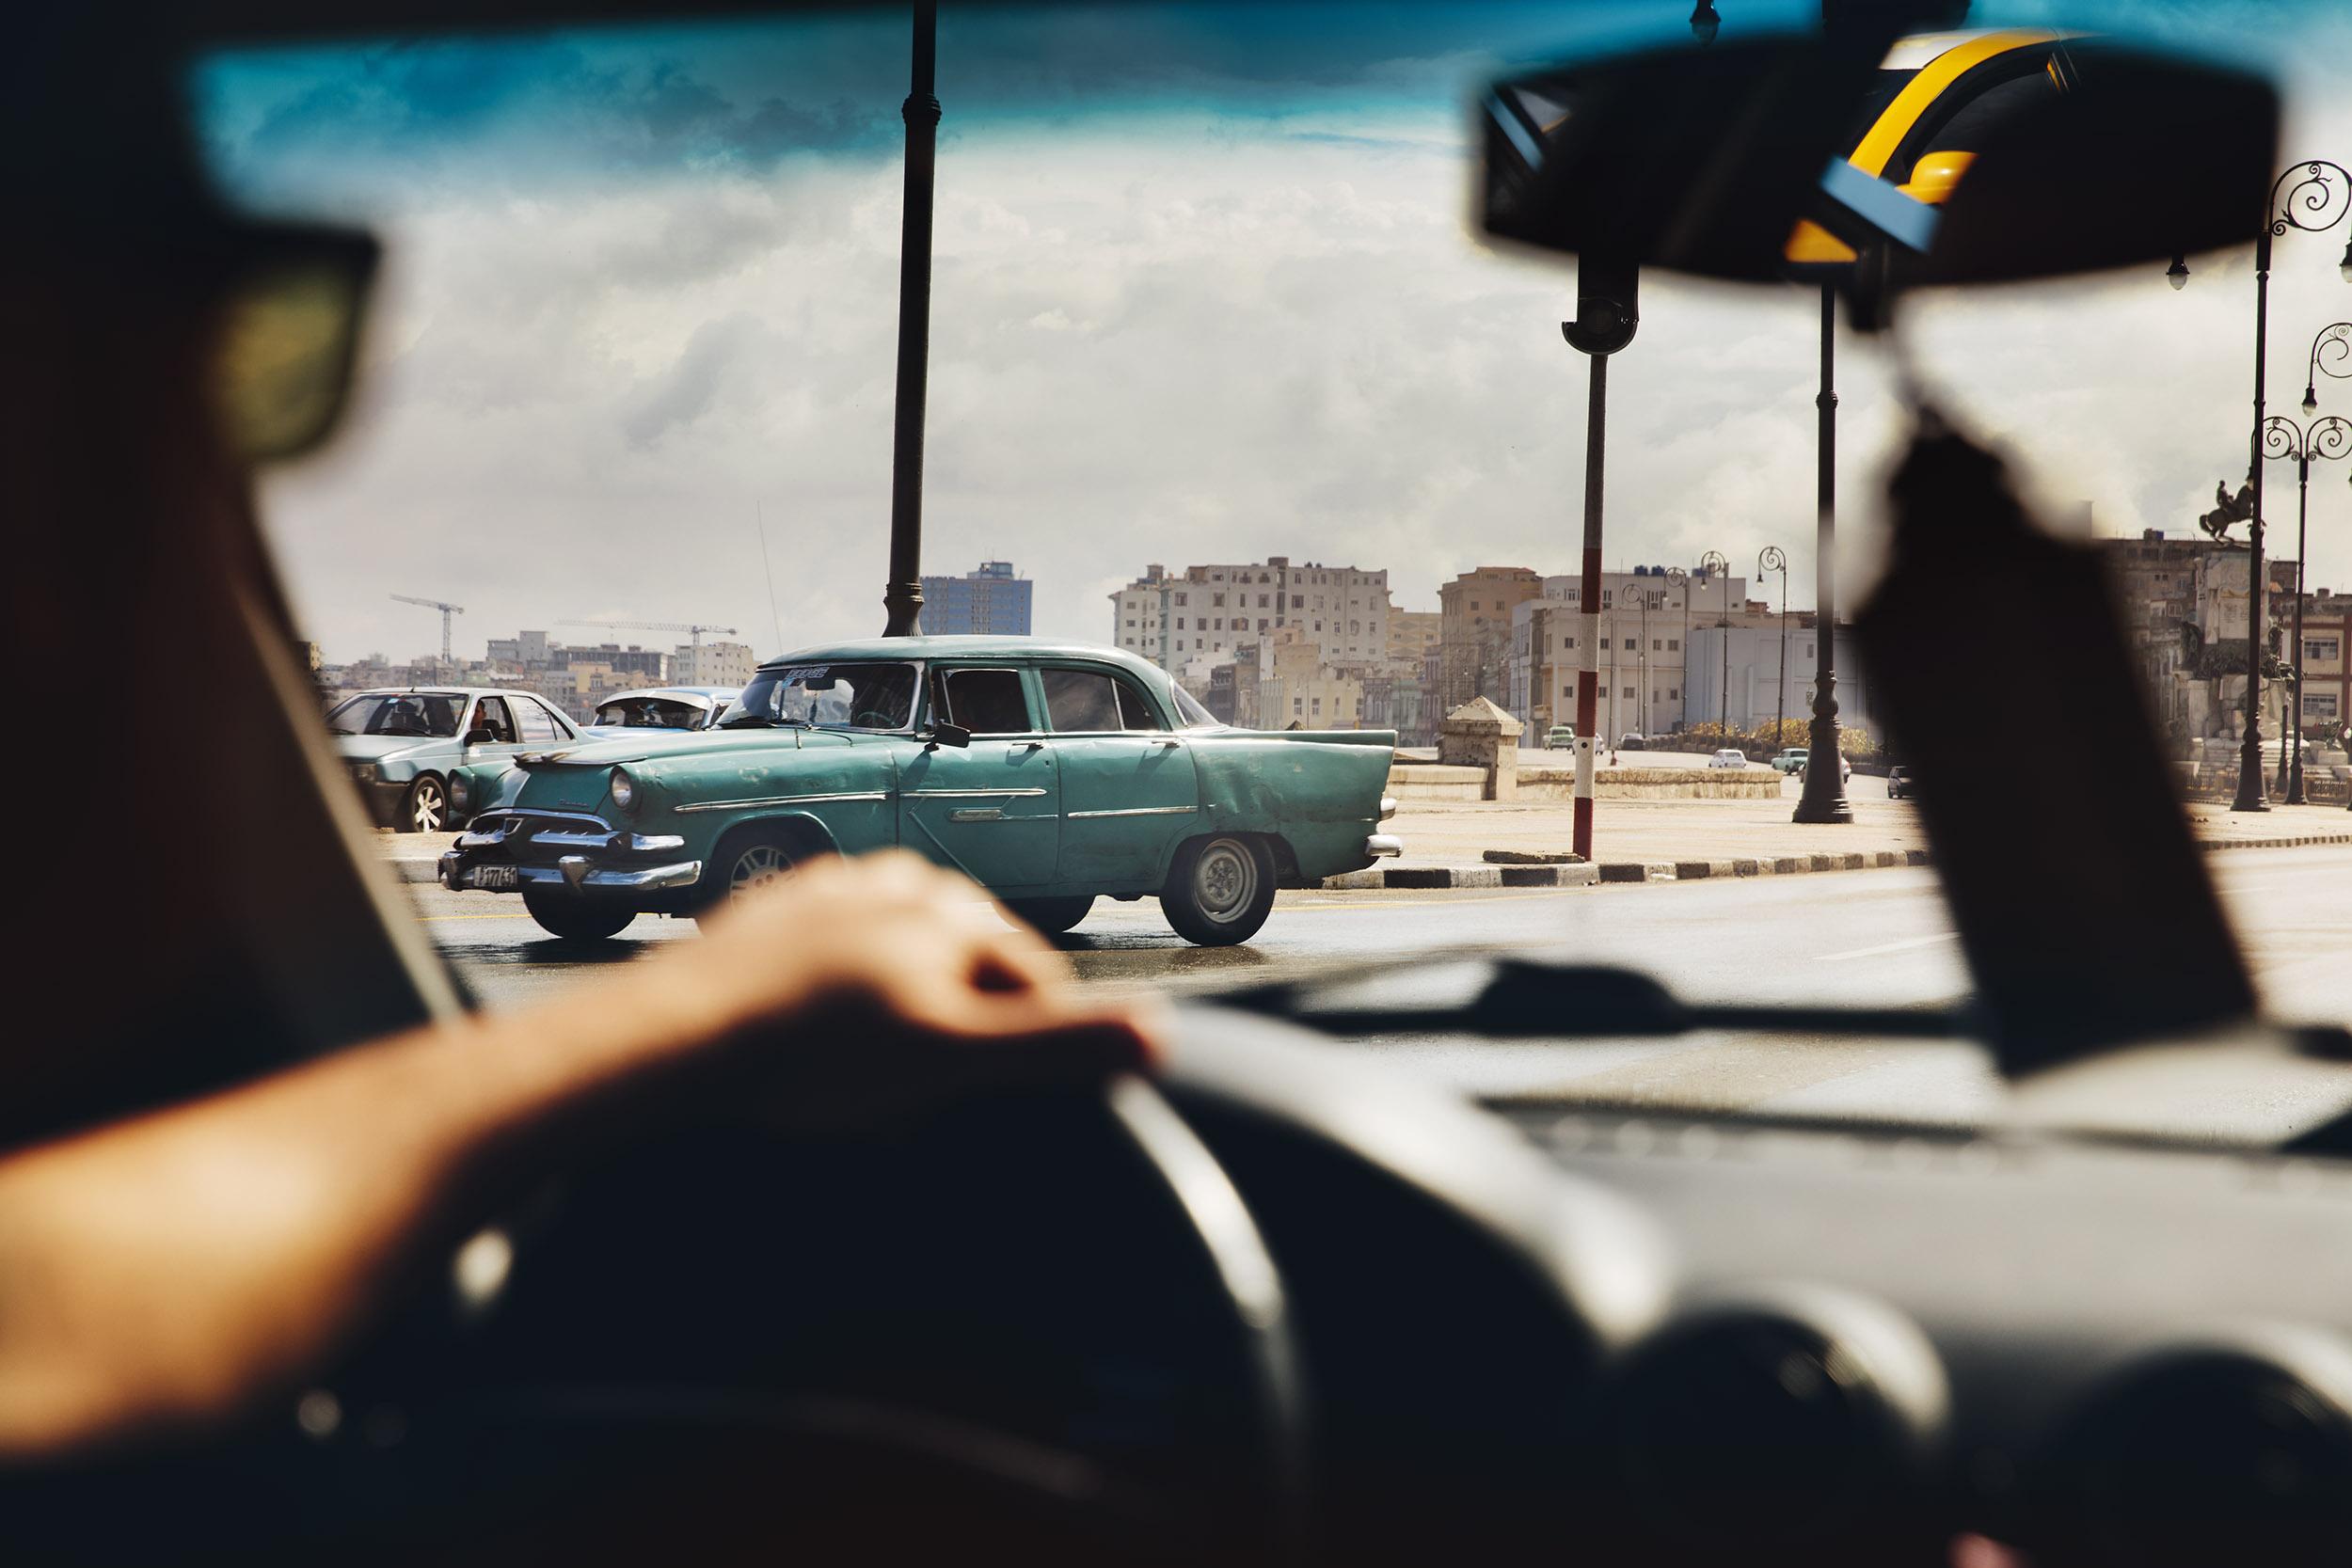 030_Cuba_-1085_V1_final copy.jpg